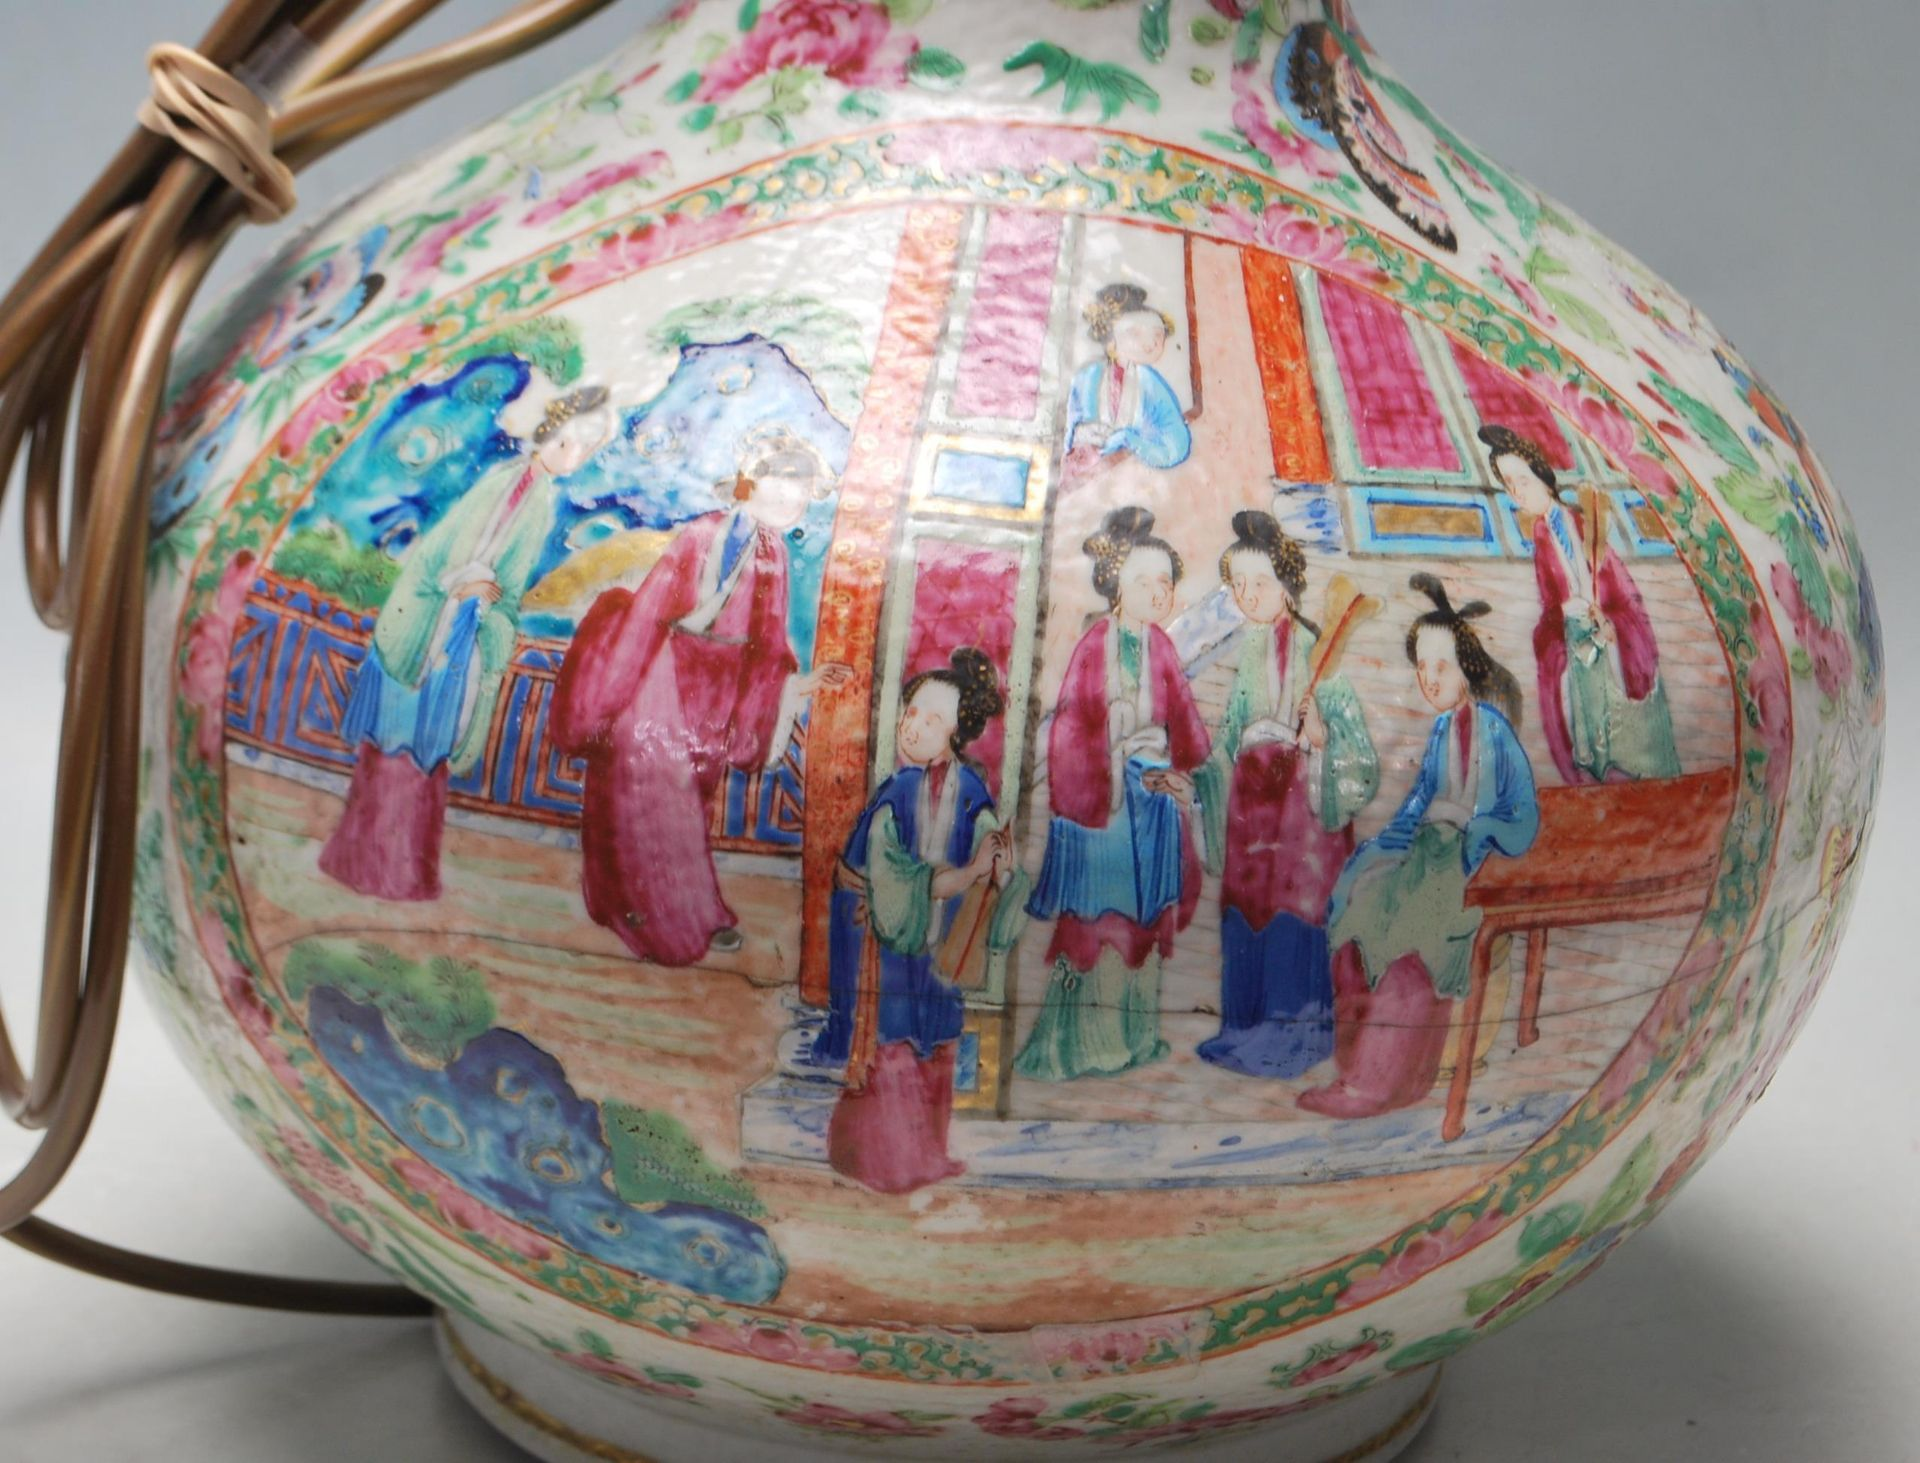 ANTIQUE CHINESE CANTON BOTTLE VASE - Image 7 of 9